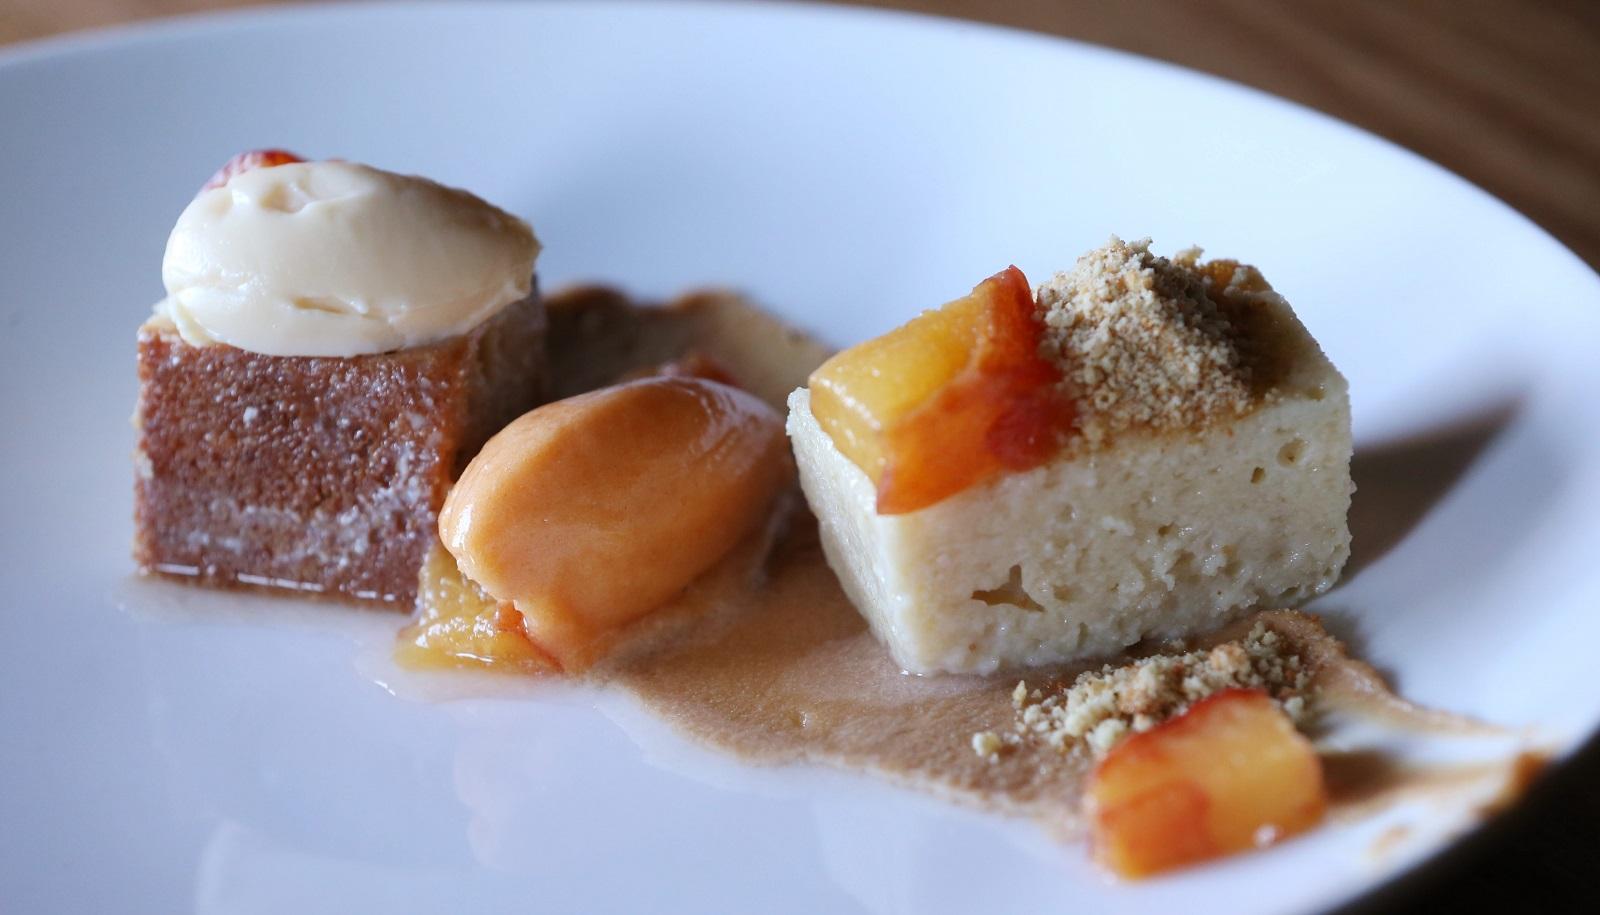 Toutant's Purty Fancy dessert is peach cake, apricot sorbet, dulce de leche and white chocolate ganache. (Sharon Cantillon/Buffalo News)